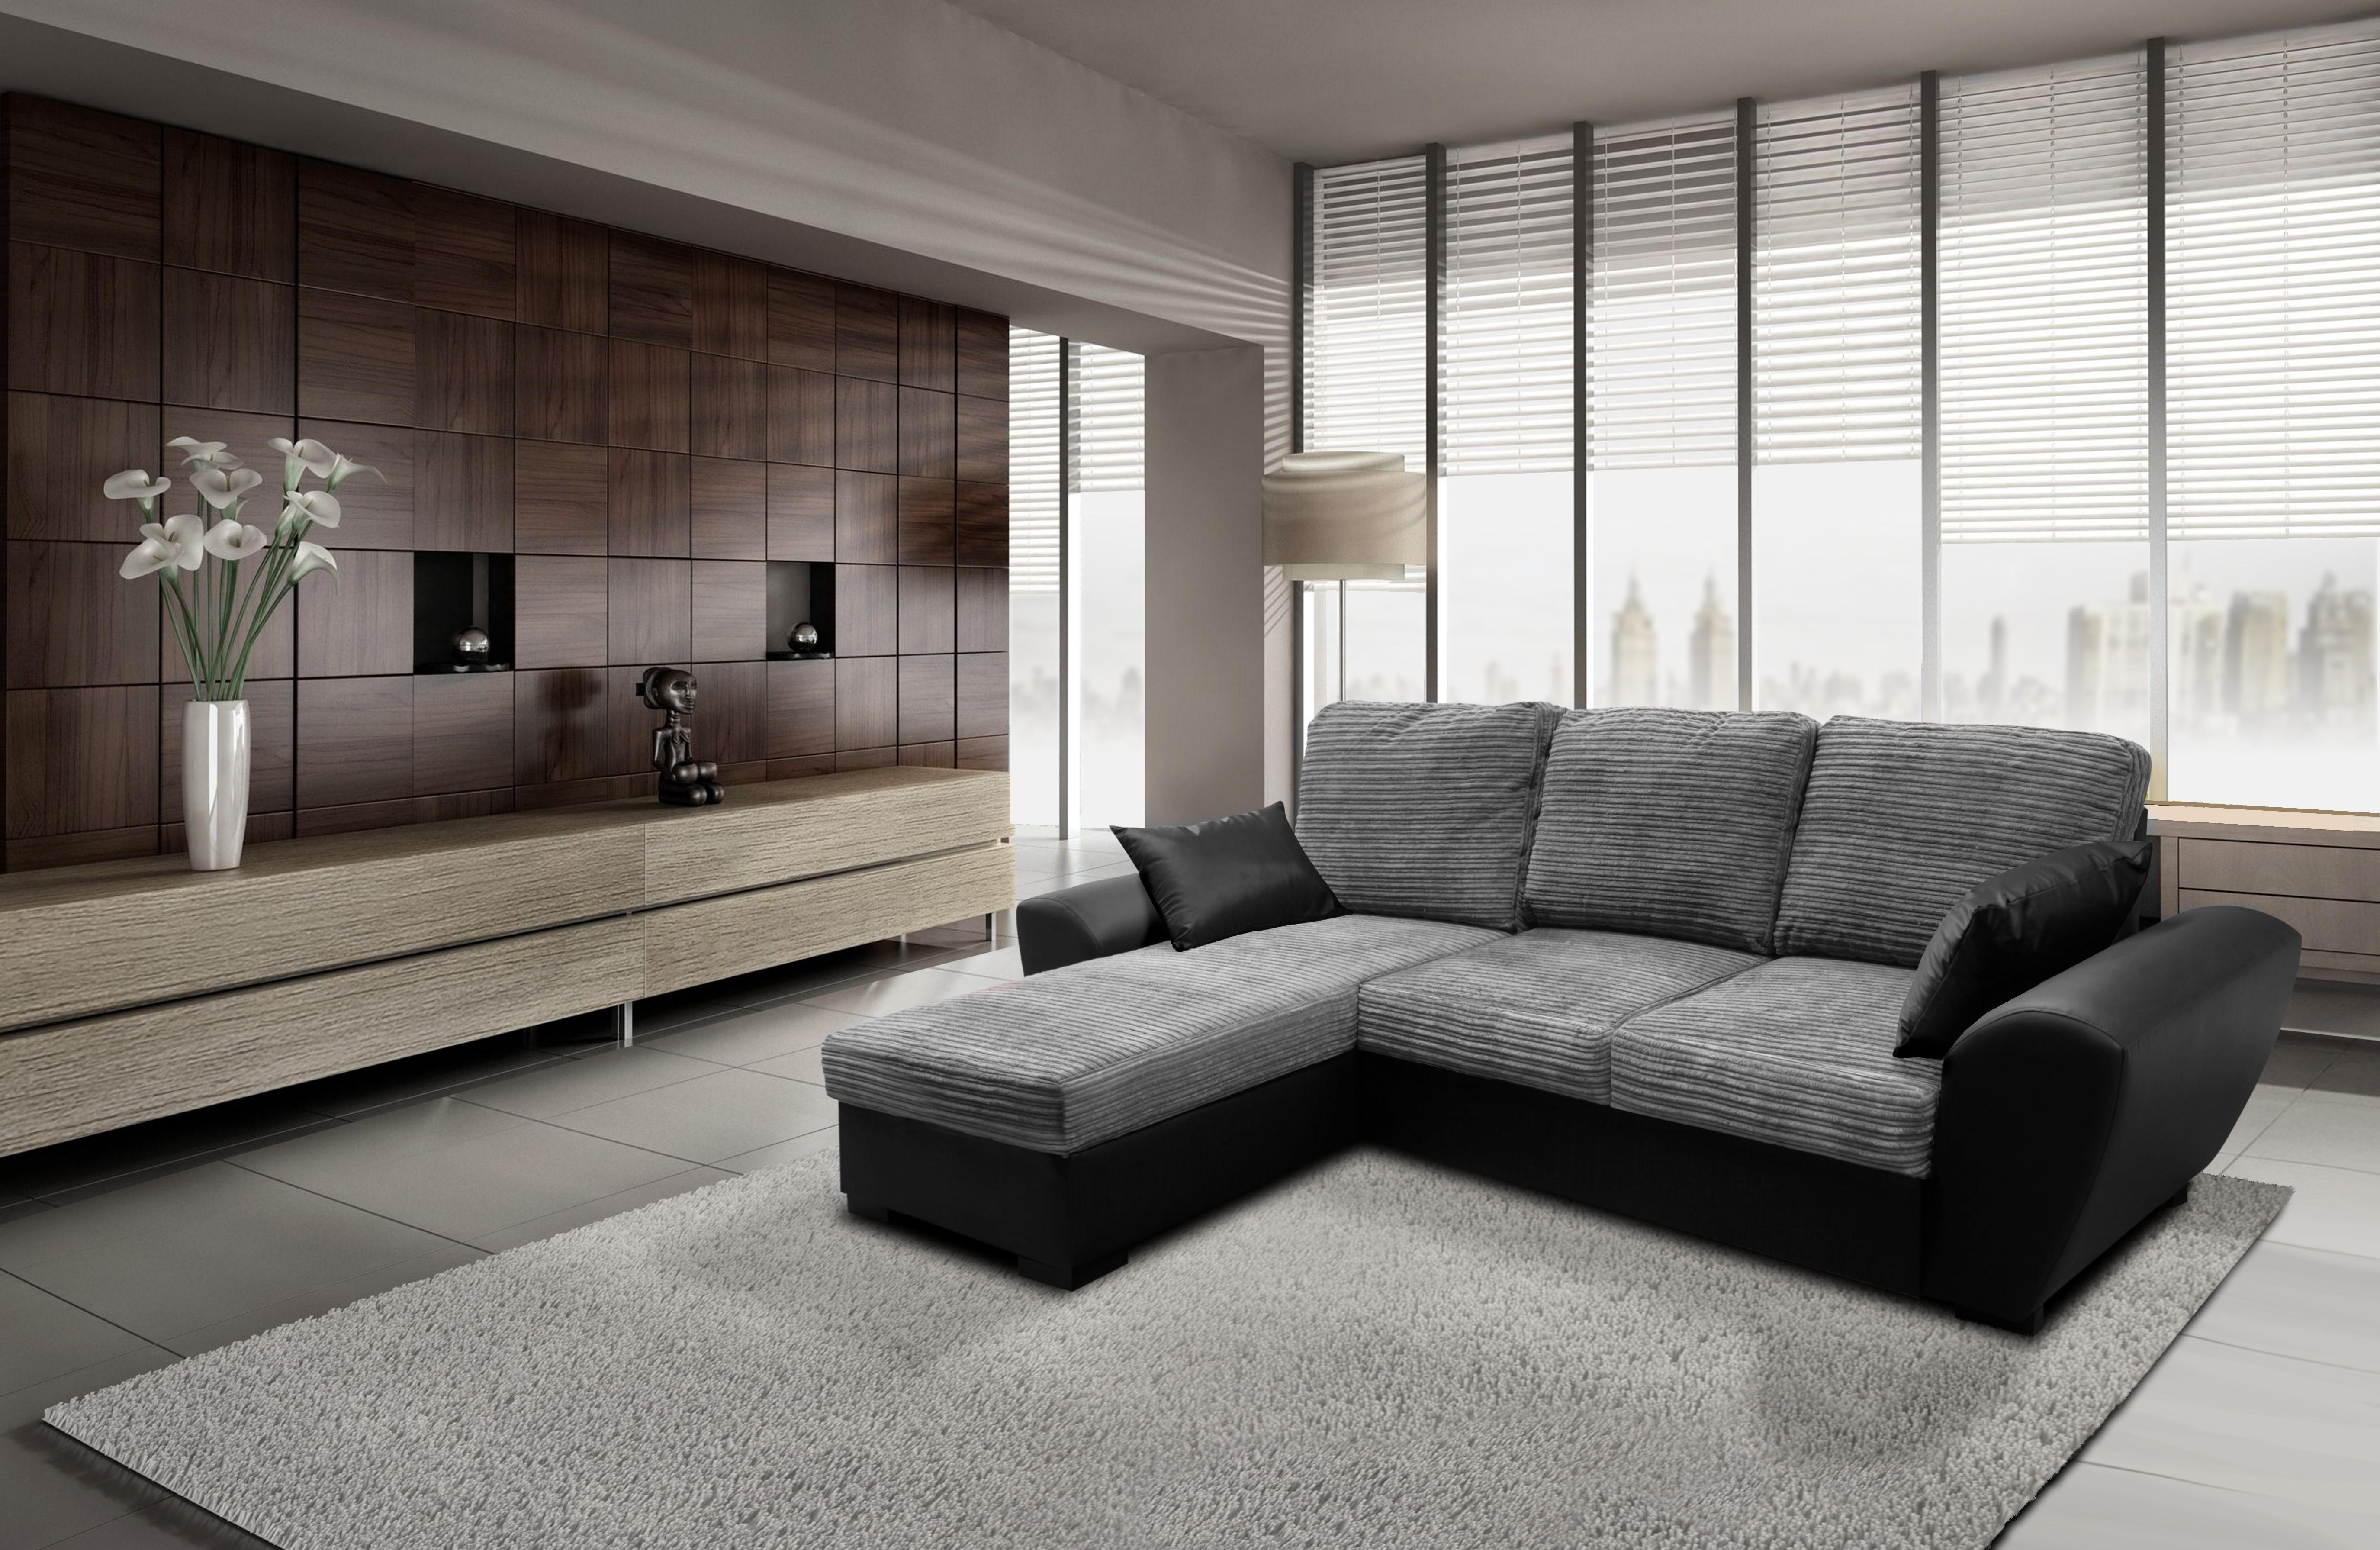 Monza Left Corner Sofa Bed Black and Grey